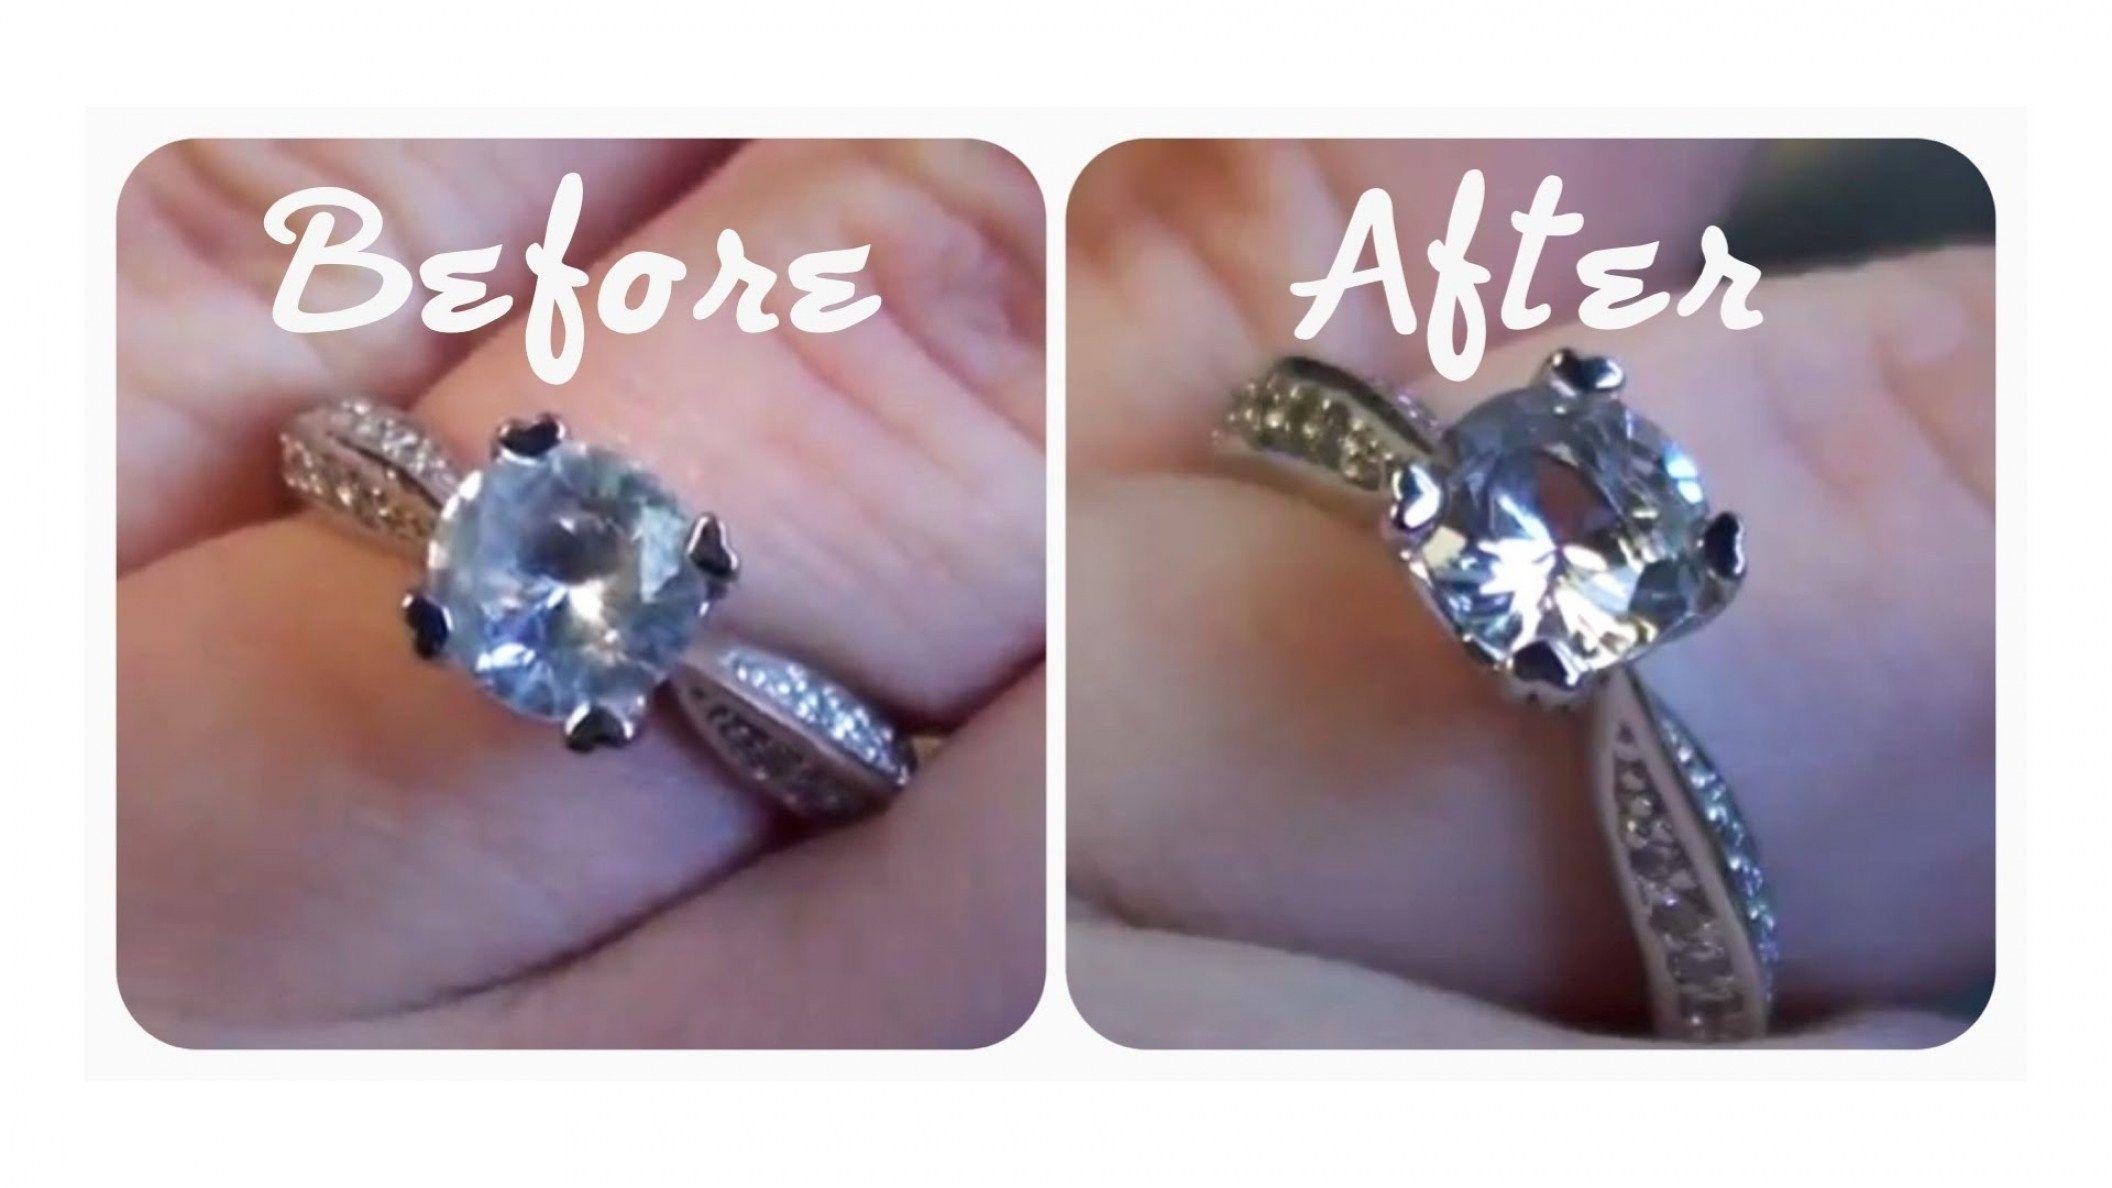 Free Diamond Rings Fake Engagement That Look Real With Regard To Wedding